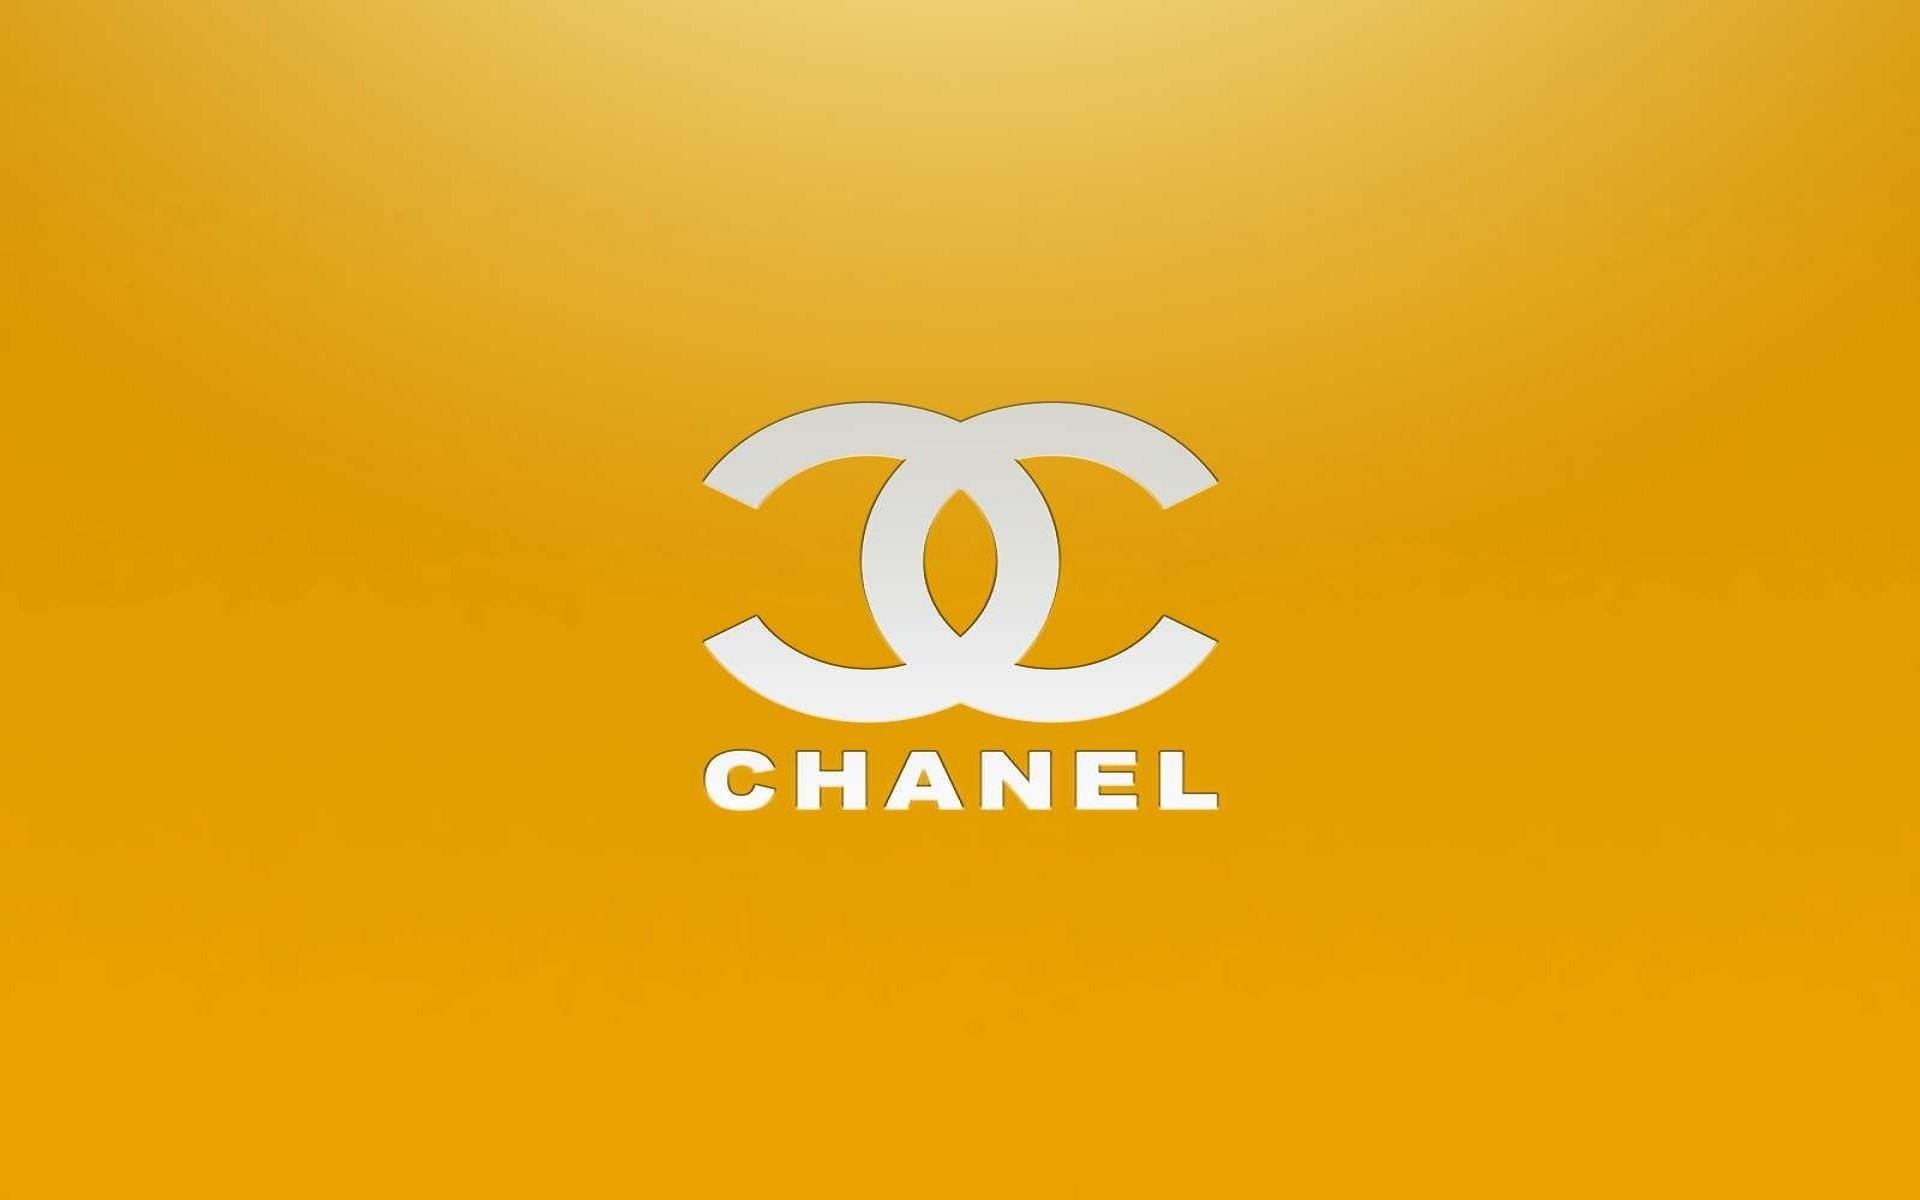 Logo Chanel Wallpapers Hd Free Download - Chanel - HD Wallpaper